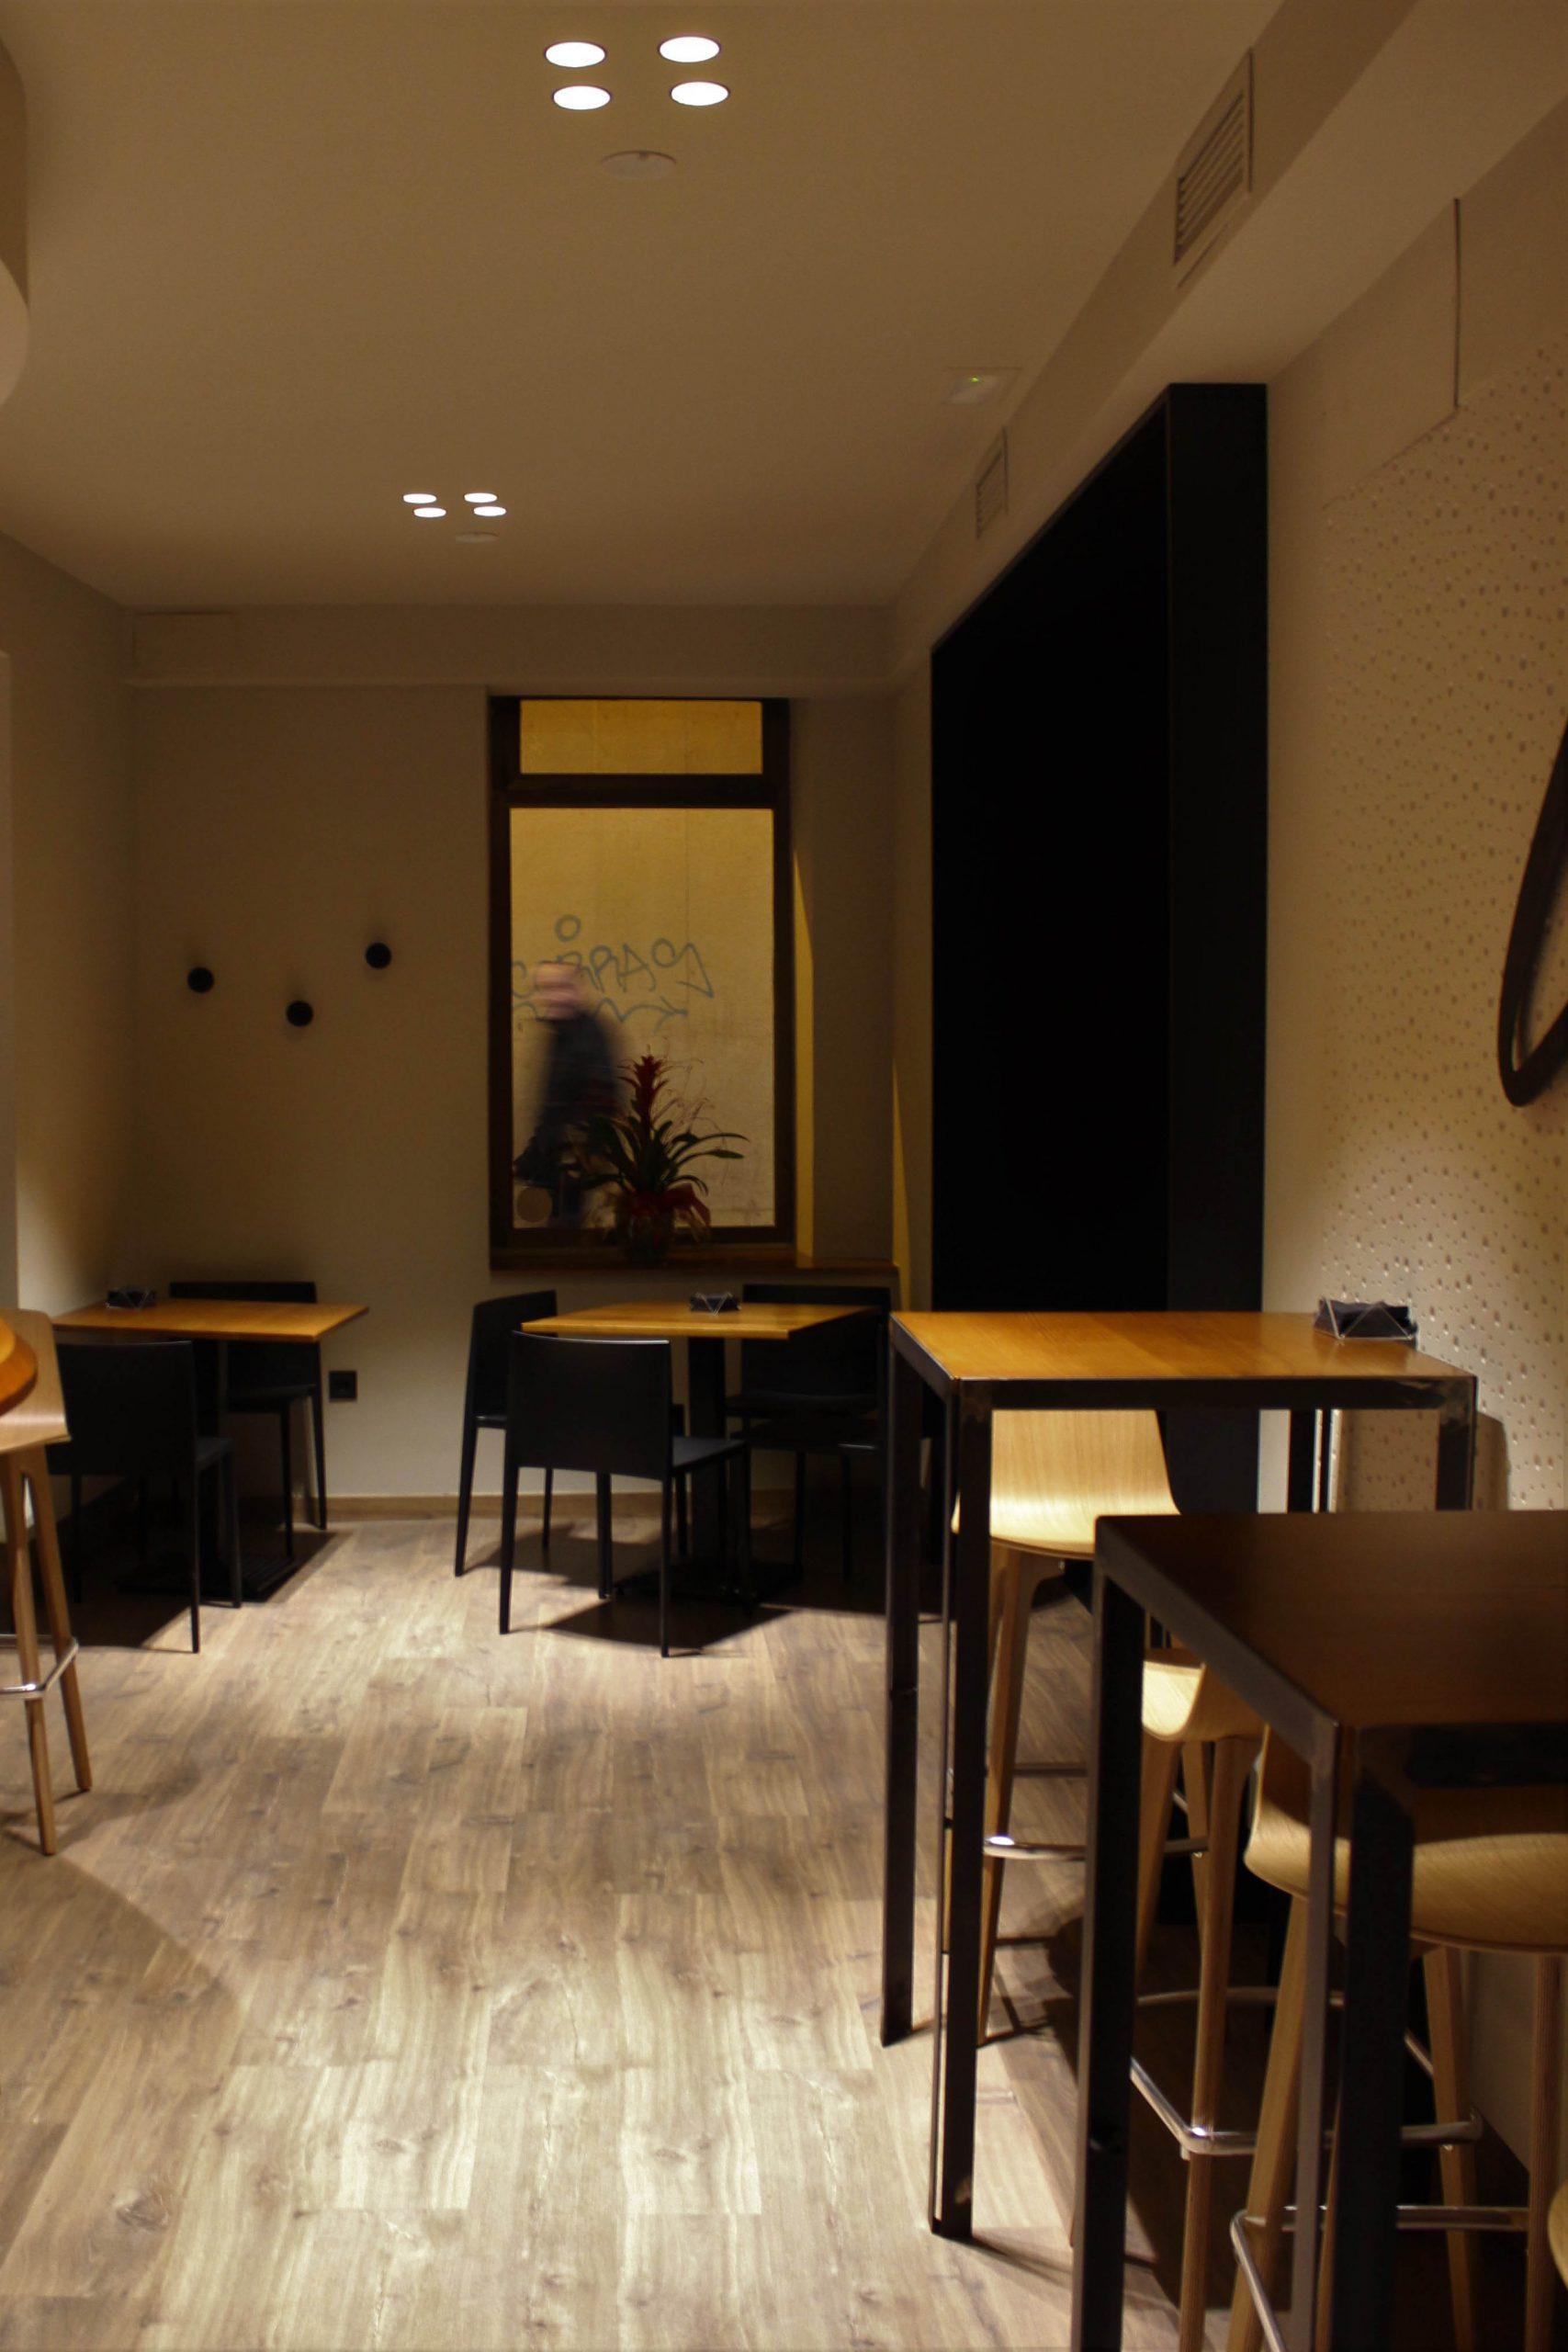 http://gustavolahera.com/wp-content/uploads/2020/11/Foto-6-Restaurante-Ullate-scaled.jpg